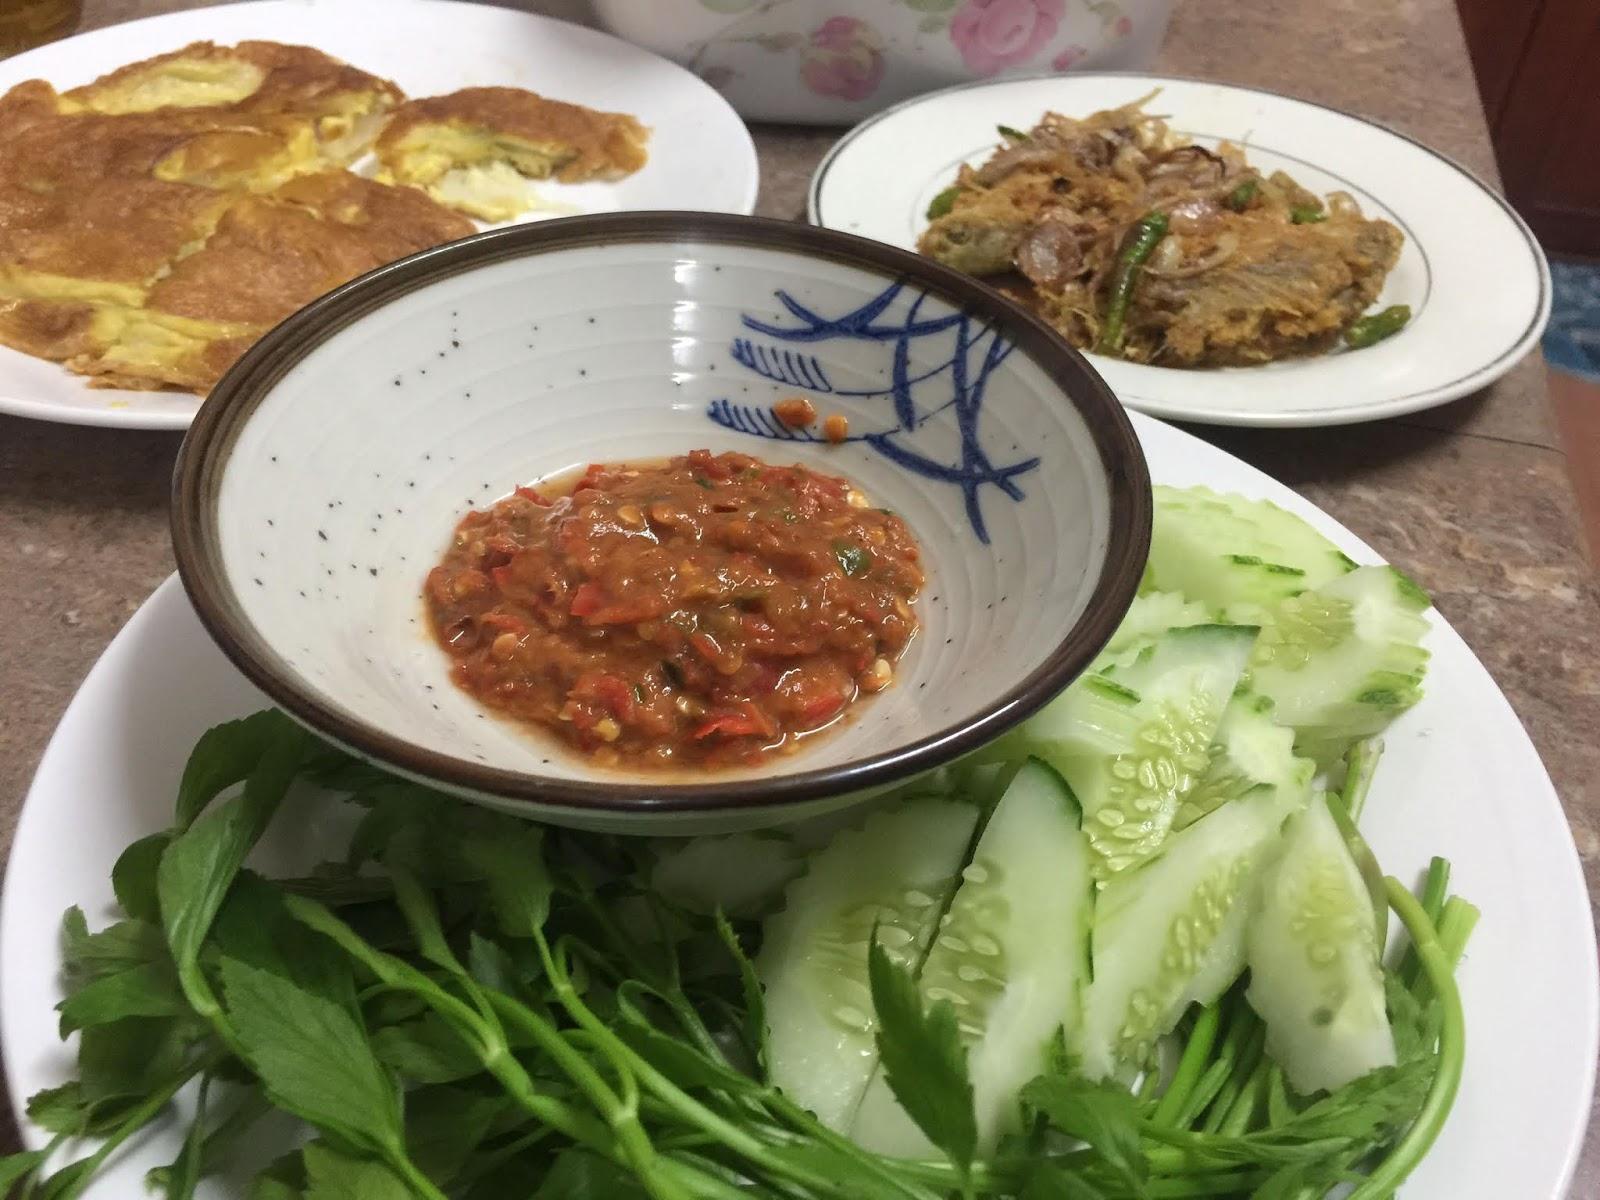 khasiat ulam-ulaman, hidangan ulam-ulaman, masakan ulam-ulaman